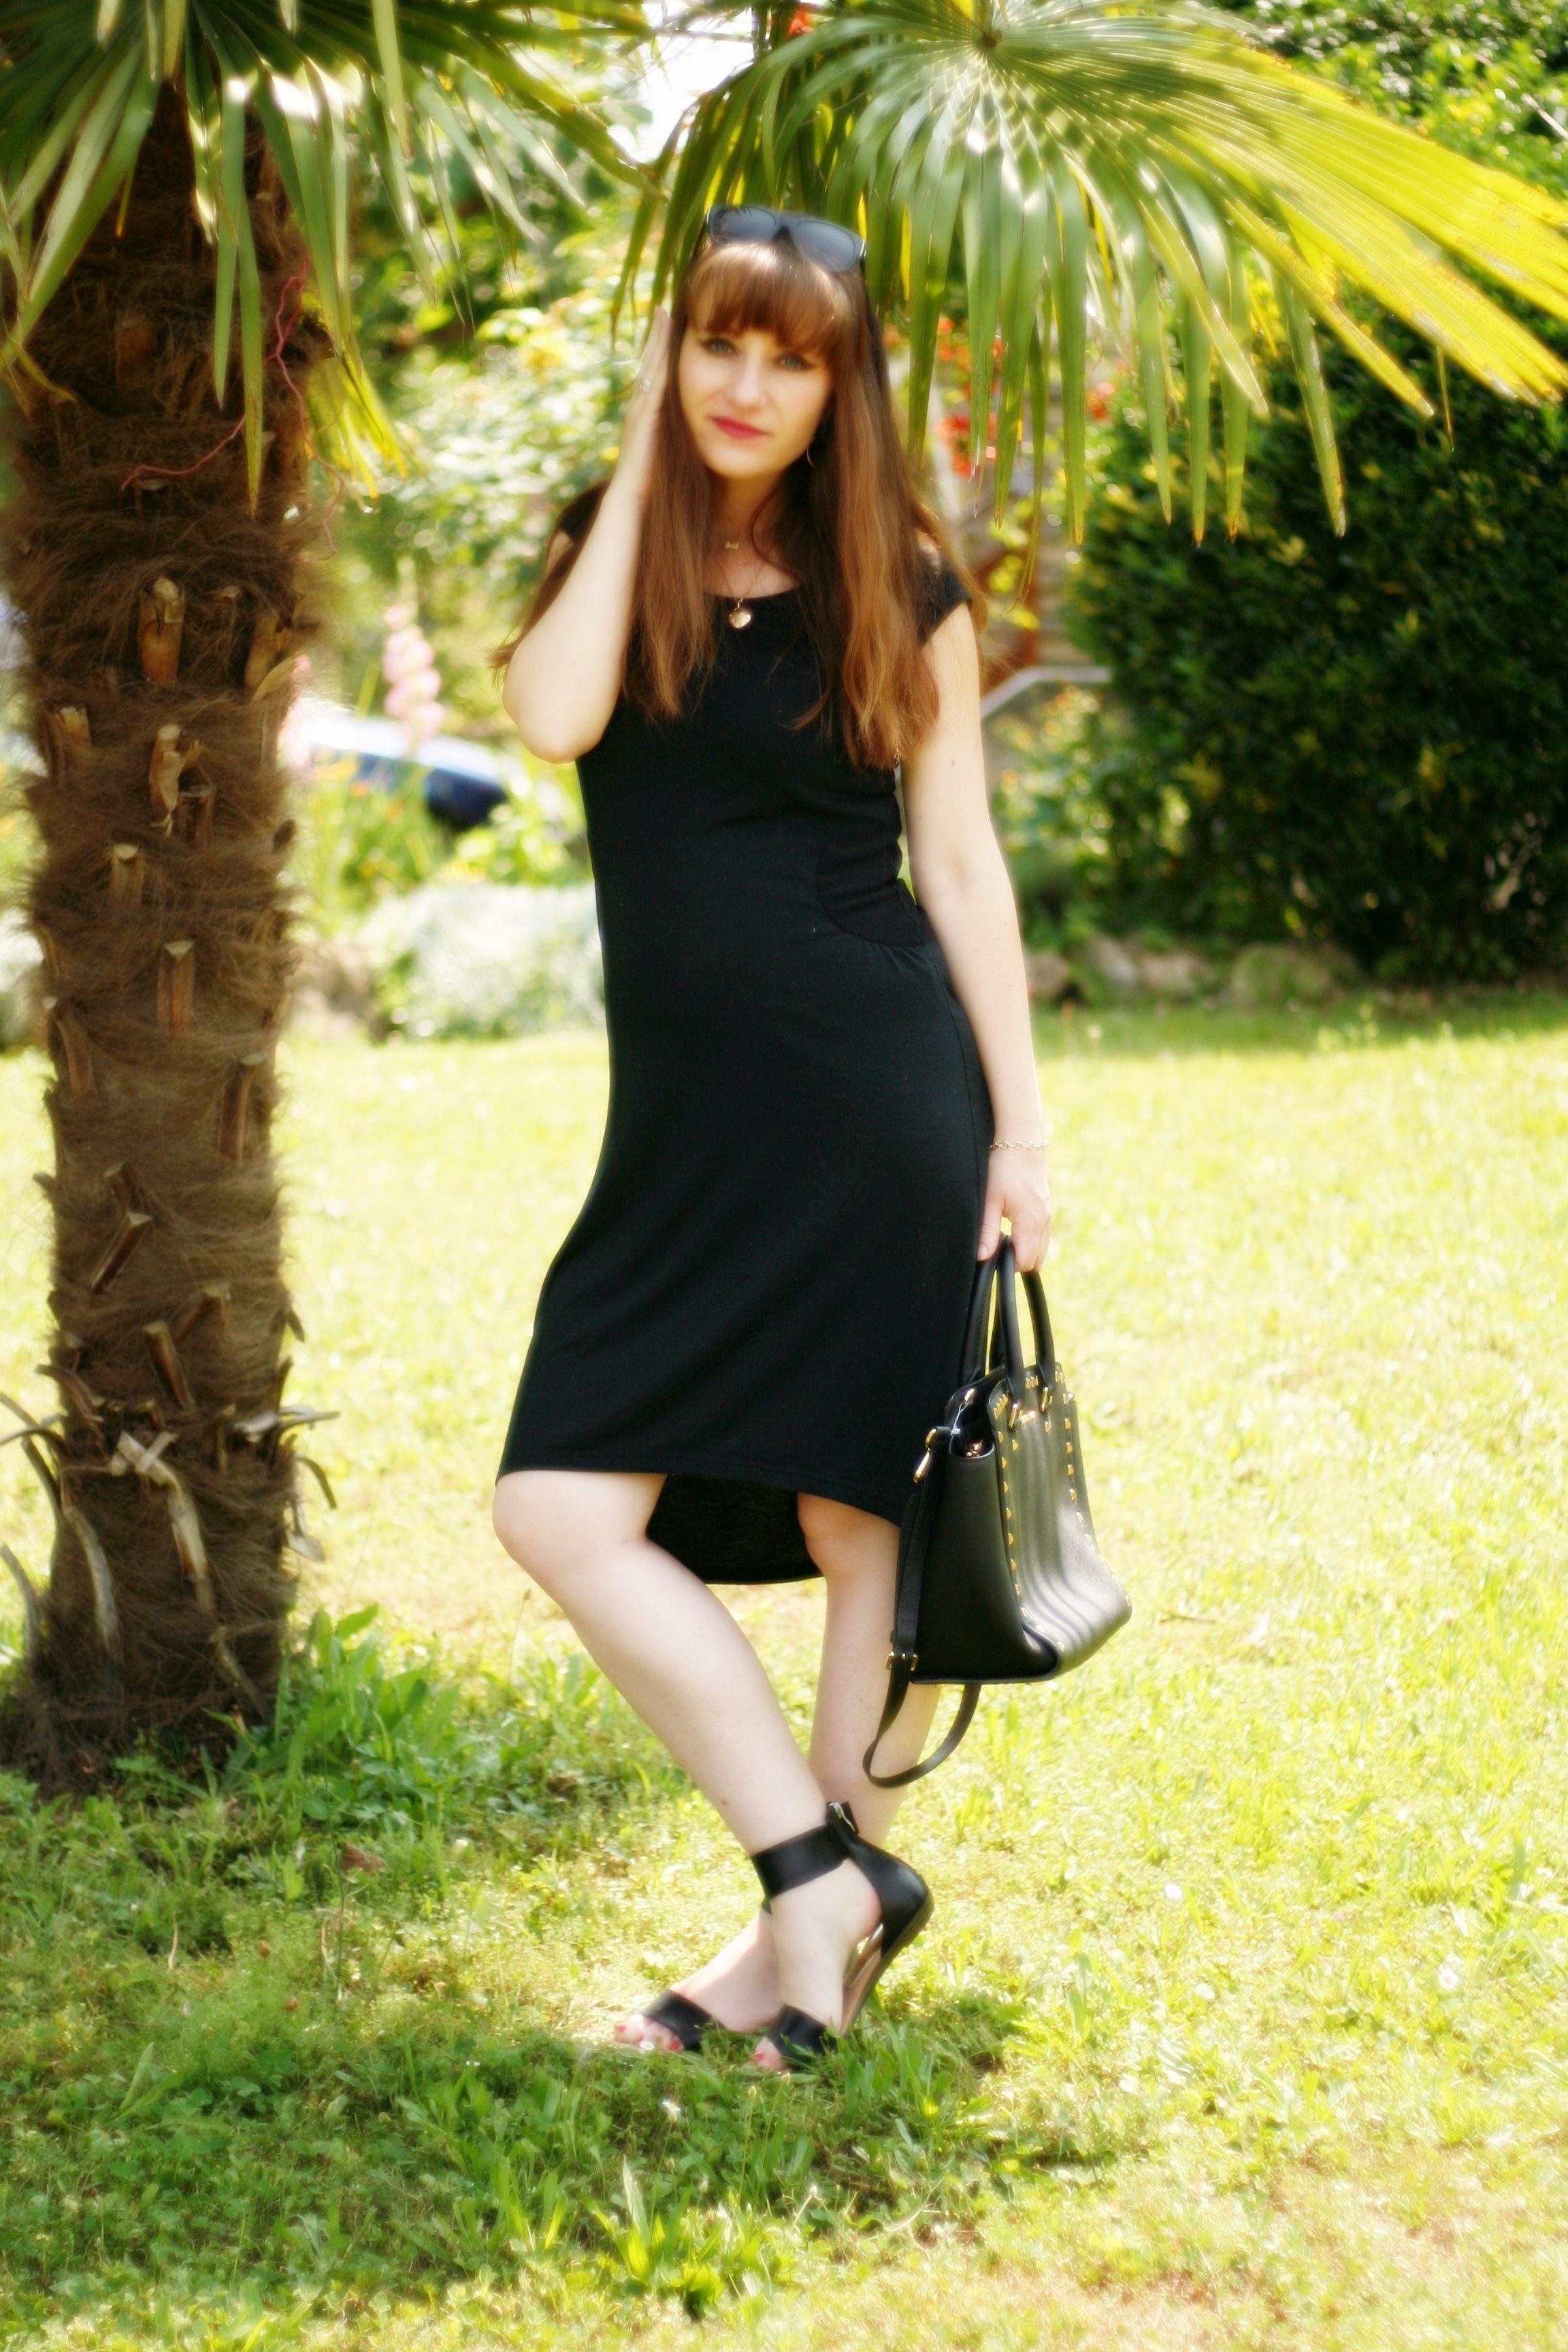 robe femme enceinte robe noire blogueuse mode